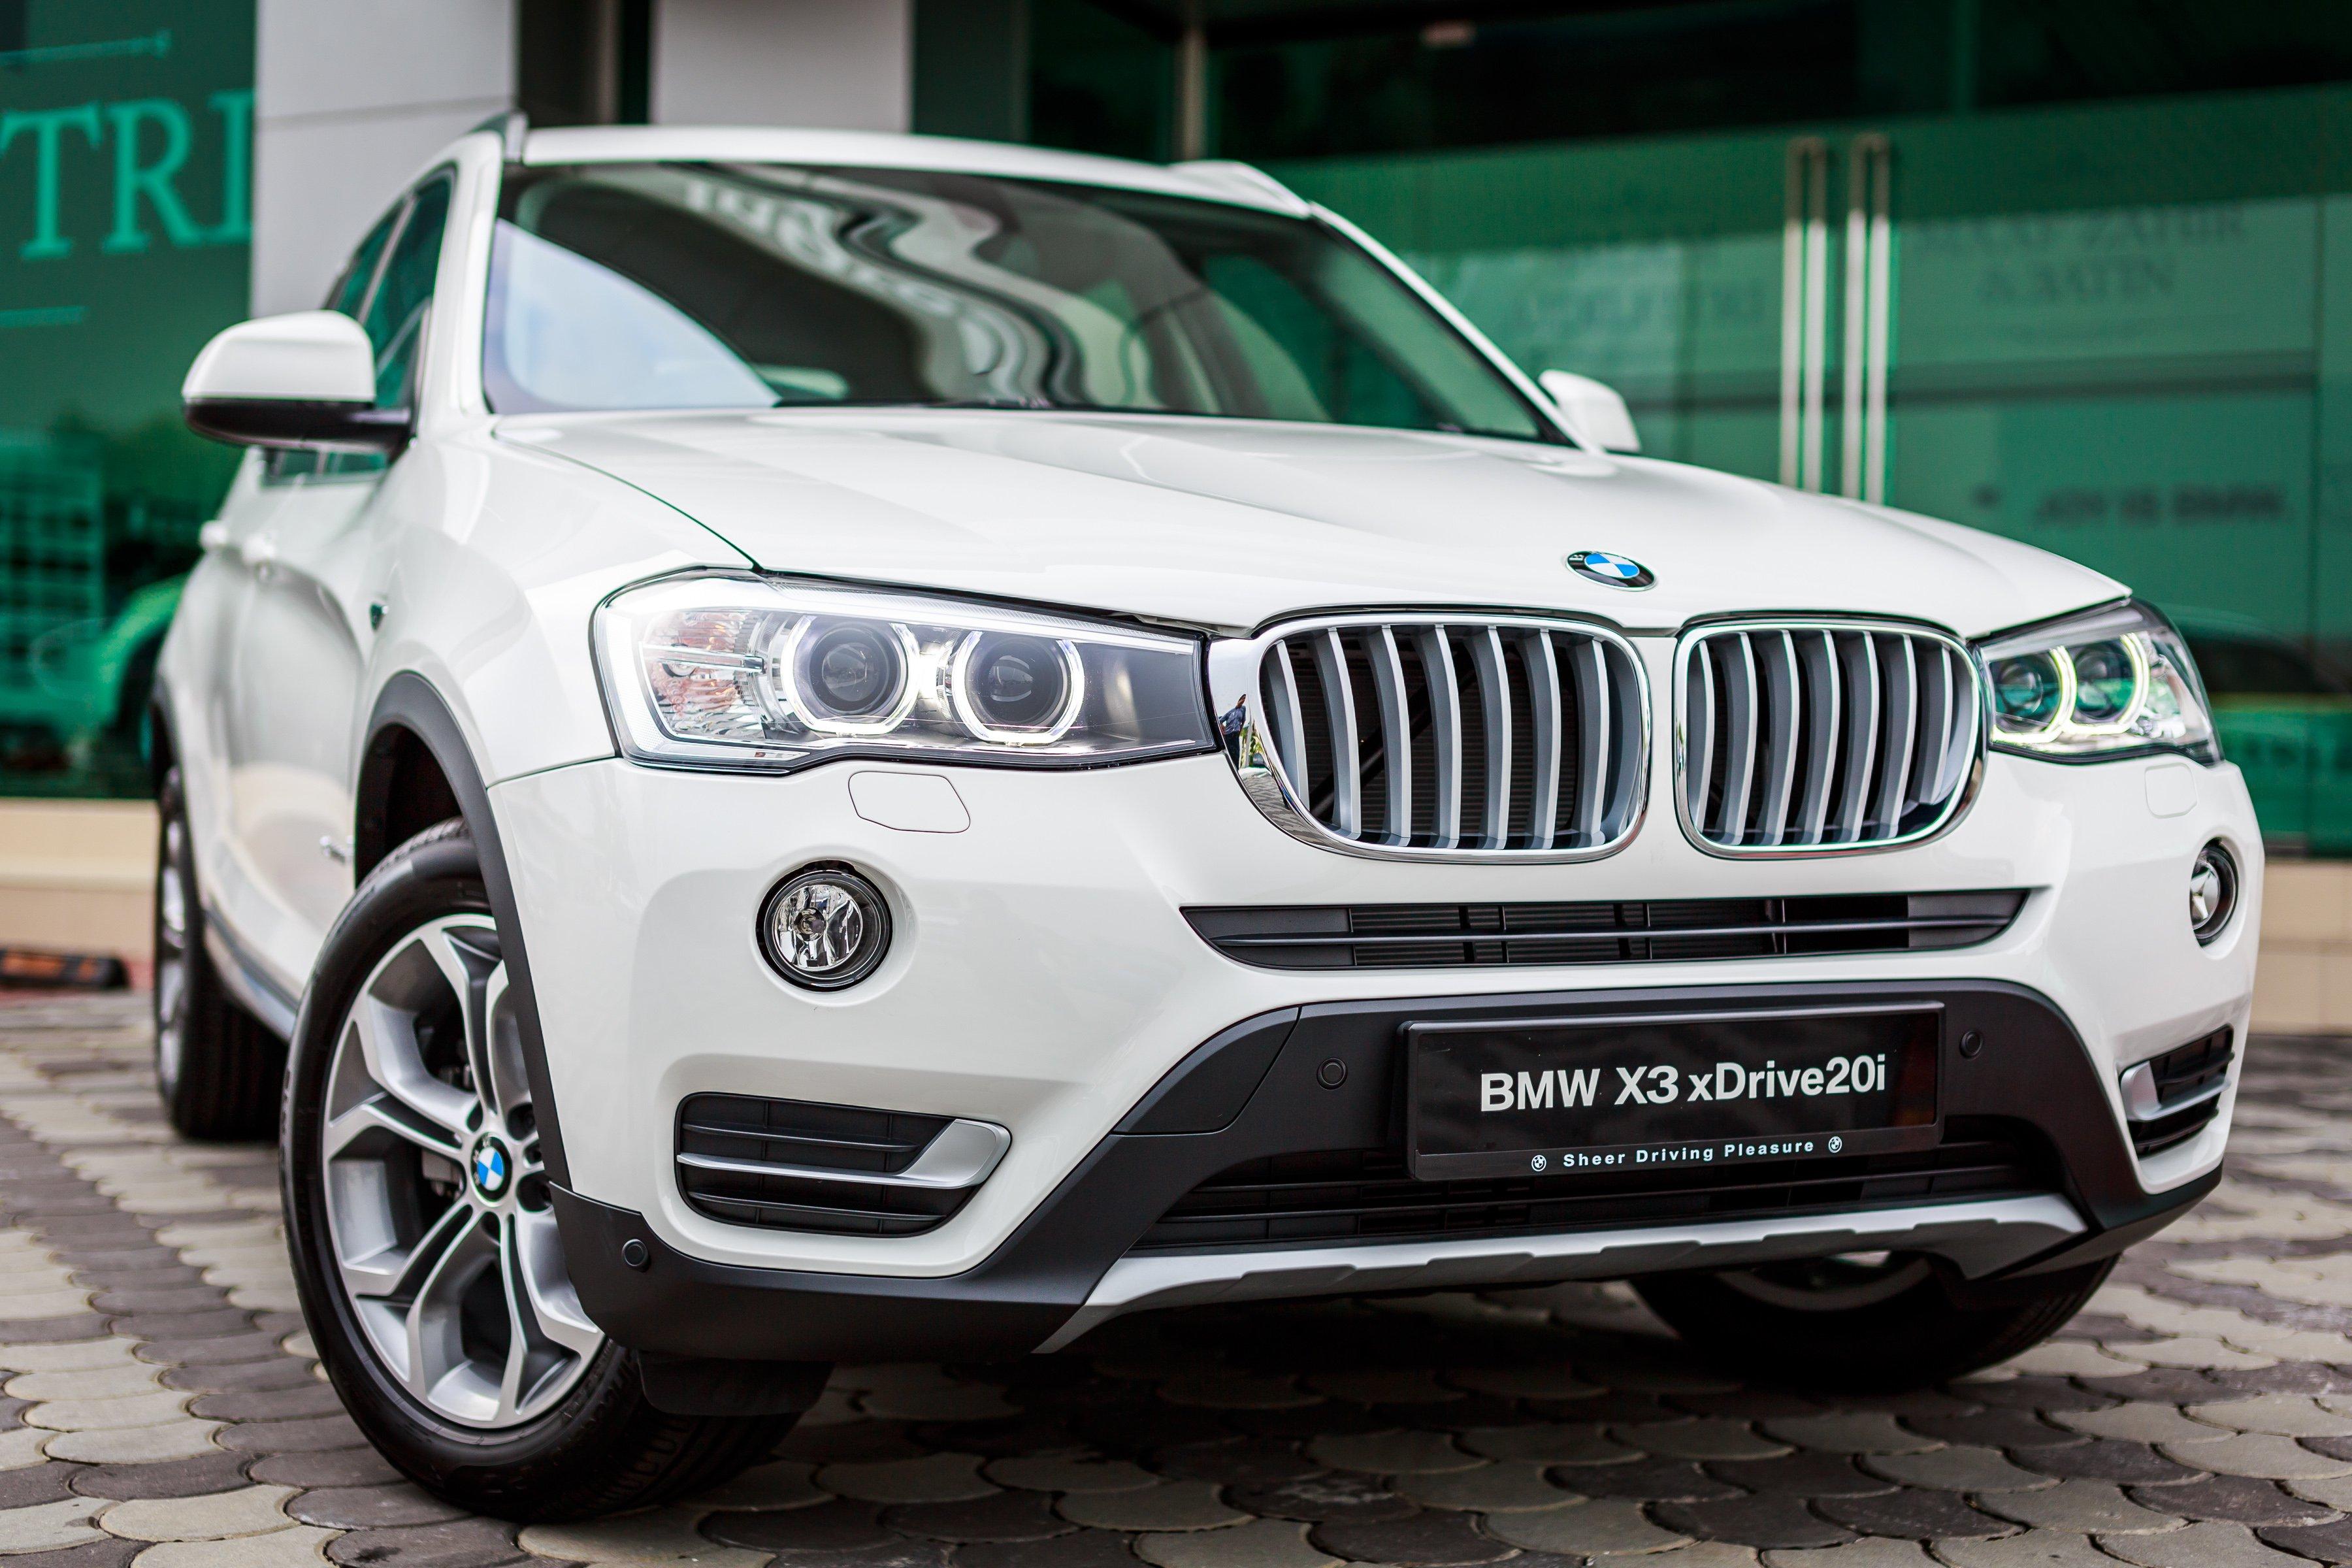 F25 BMW X3 LCI debuts in Malaysia - two CKD variants, xDrive20i RM329k and xDrive20d RM349k